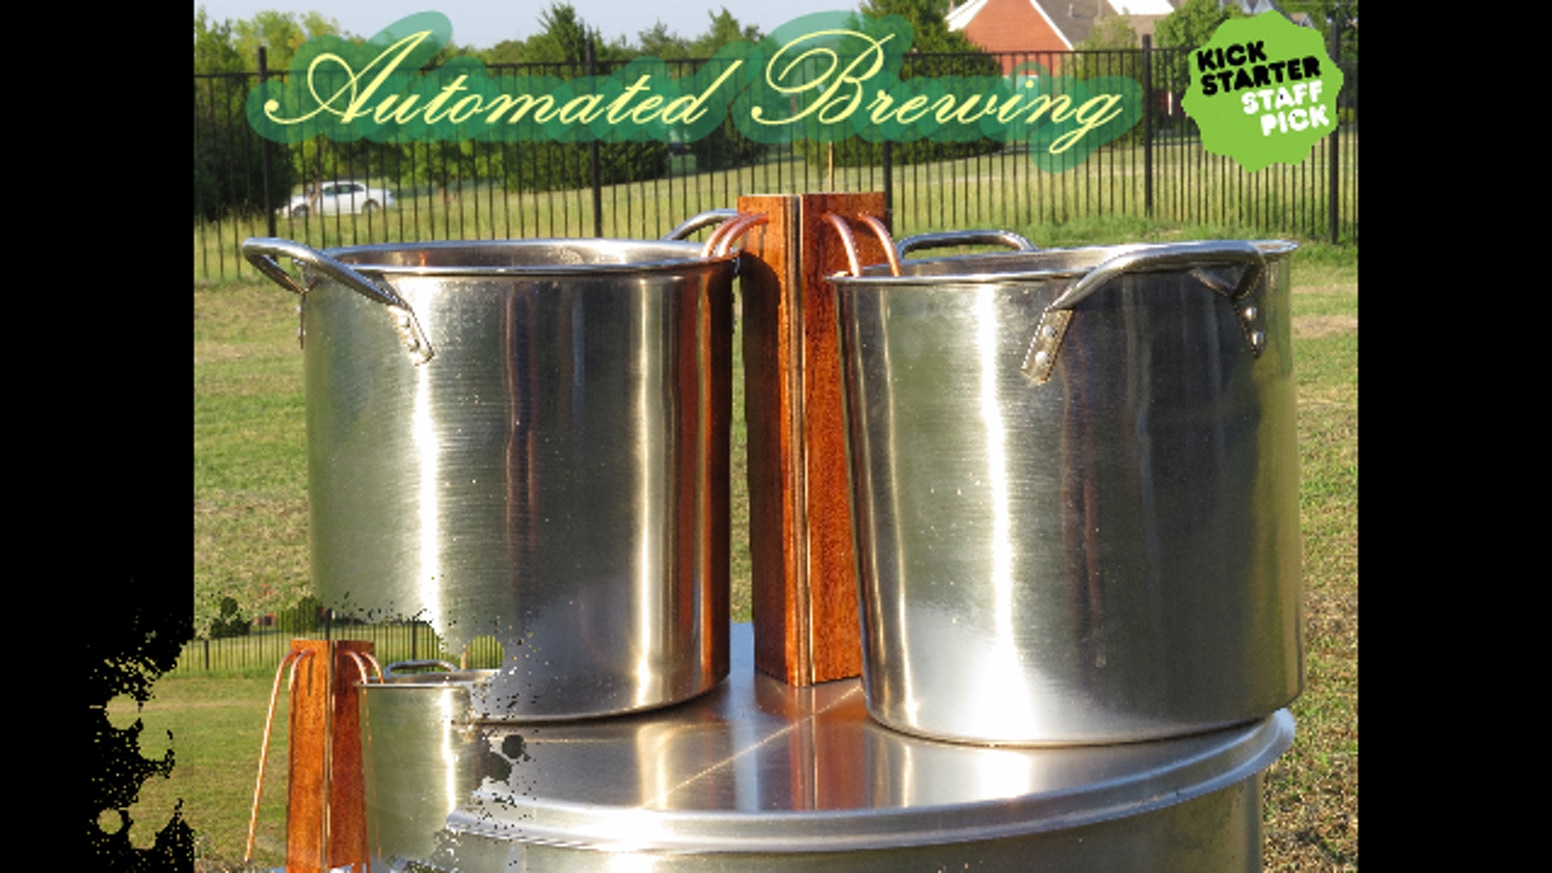 Bieree: Smart-phone beer brewing by Leo Innovations LLC